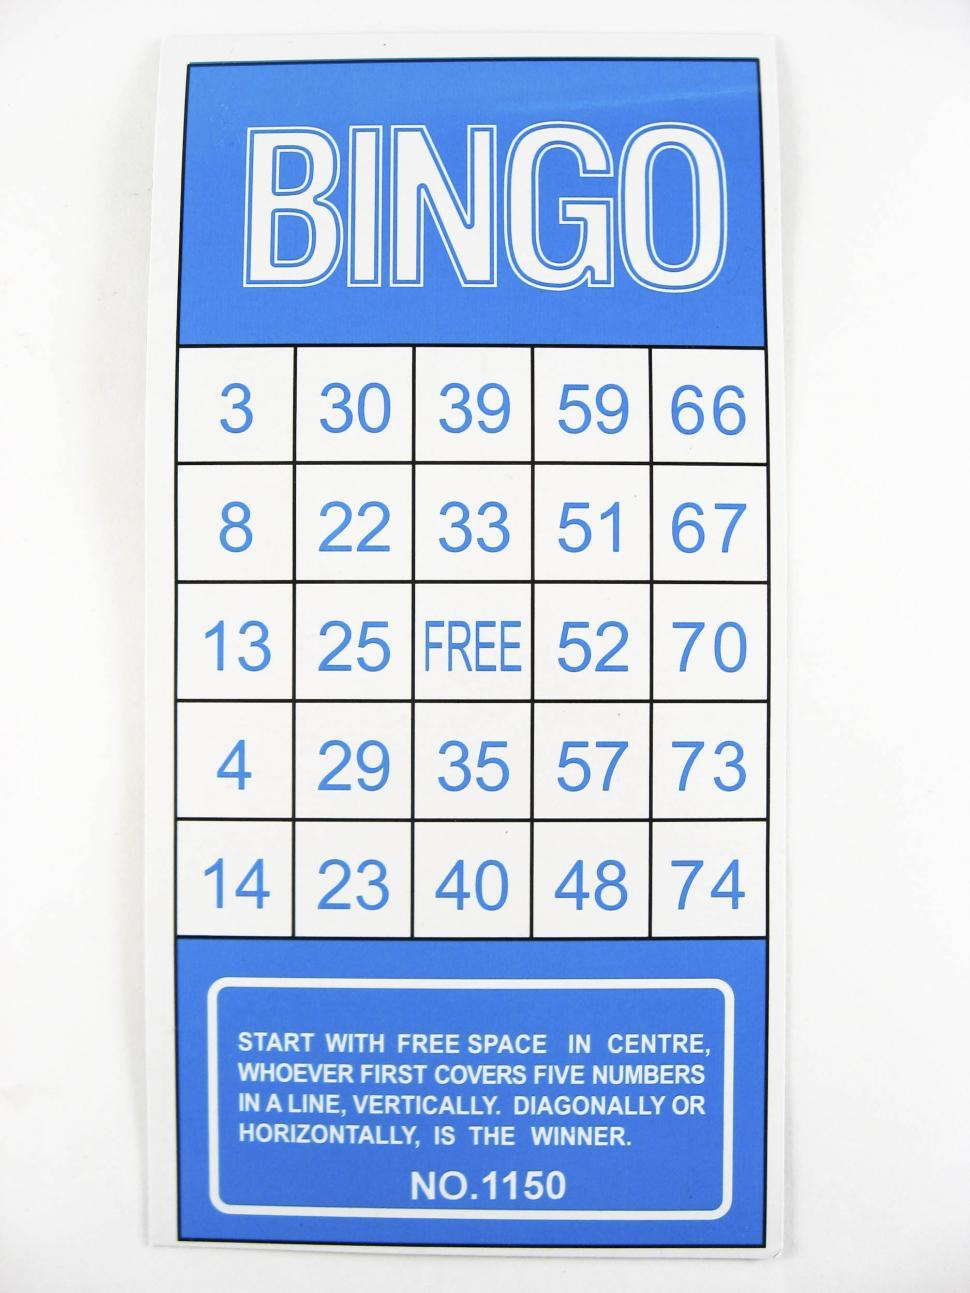 Download Free Stock Photo of bingo sheet